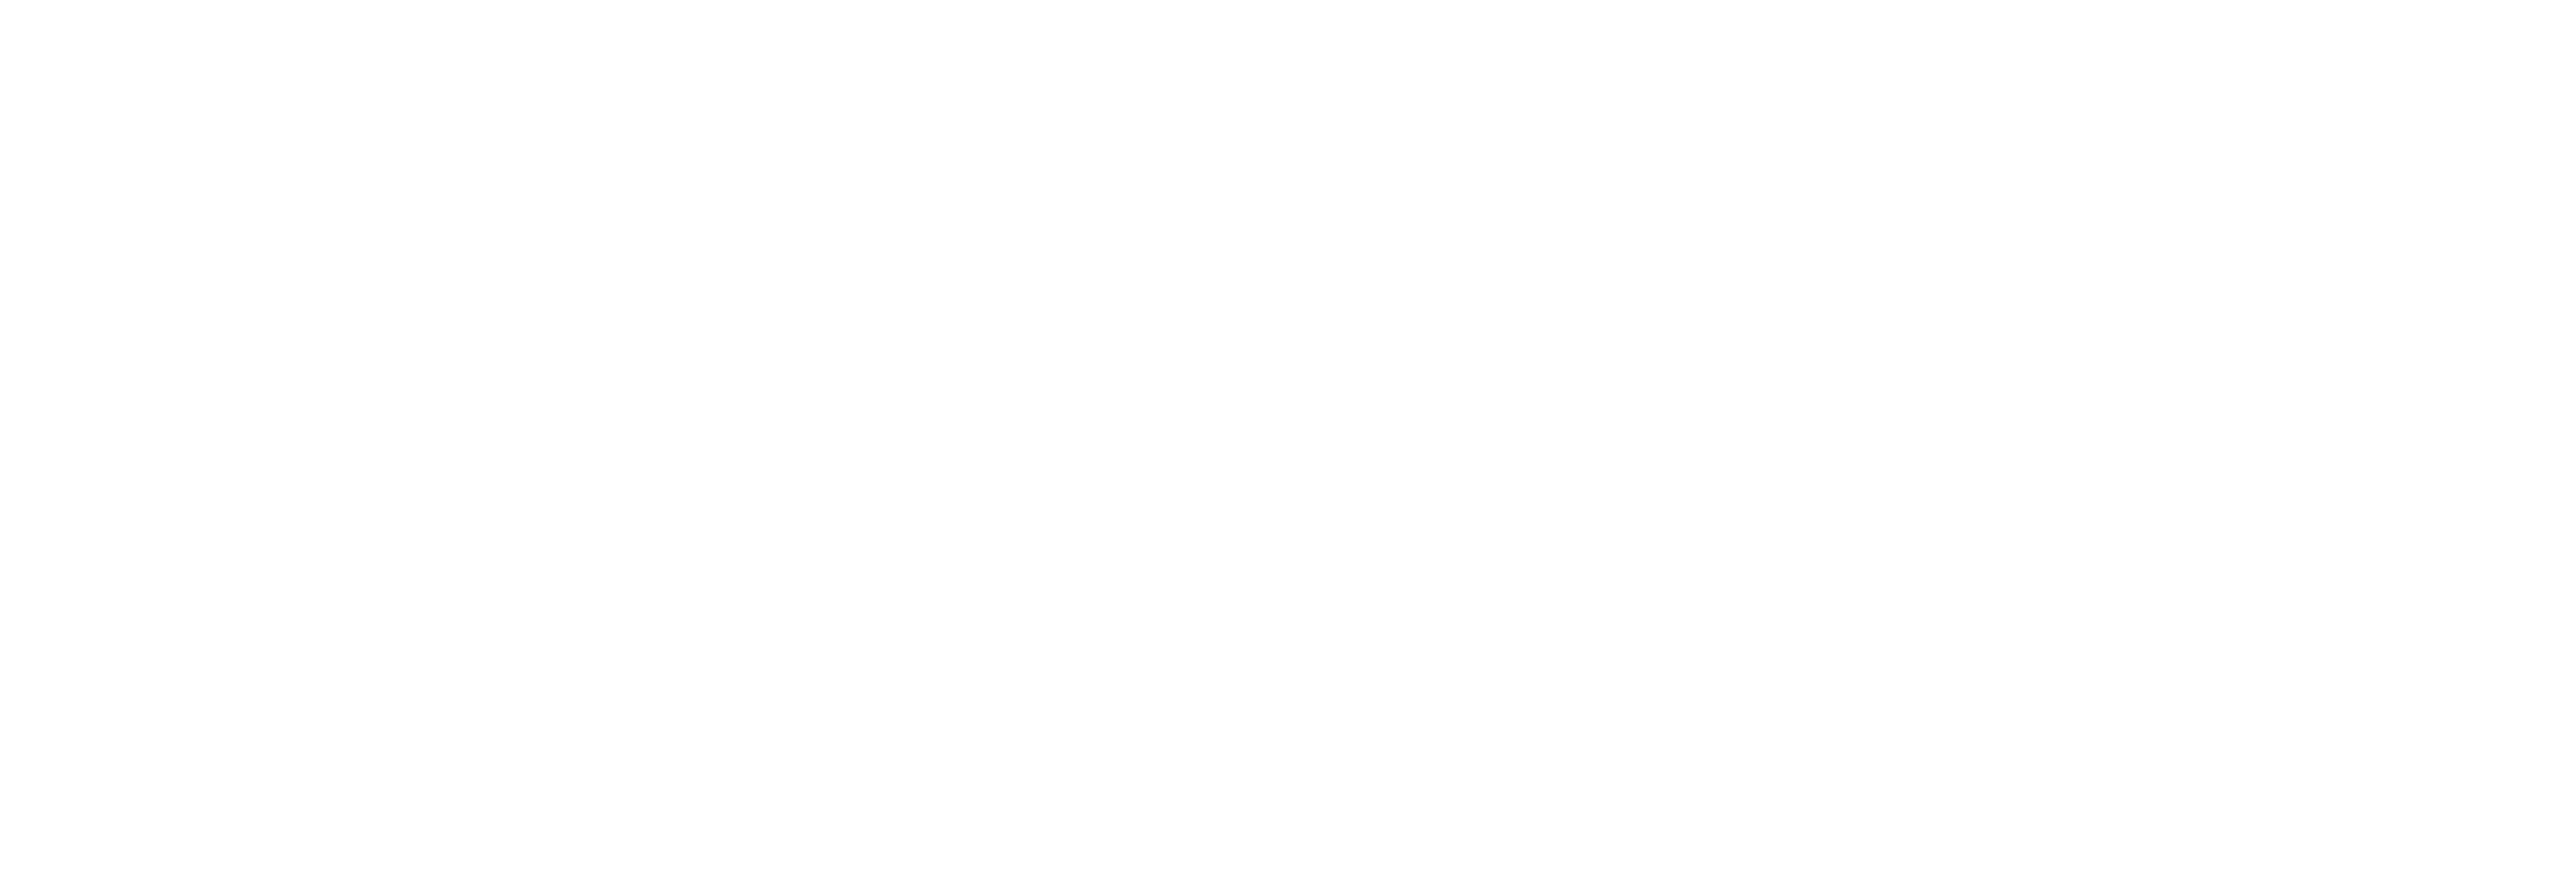 The American Company of Irish Dance